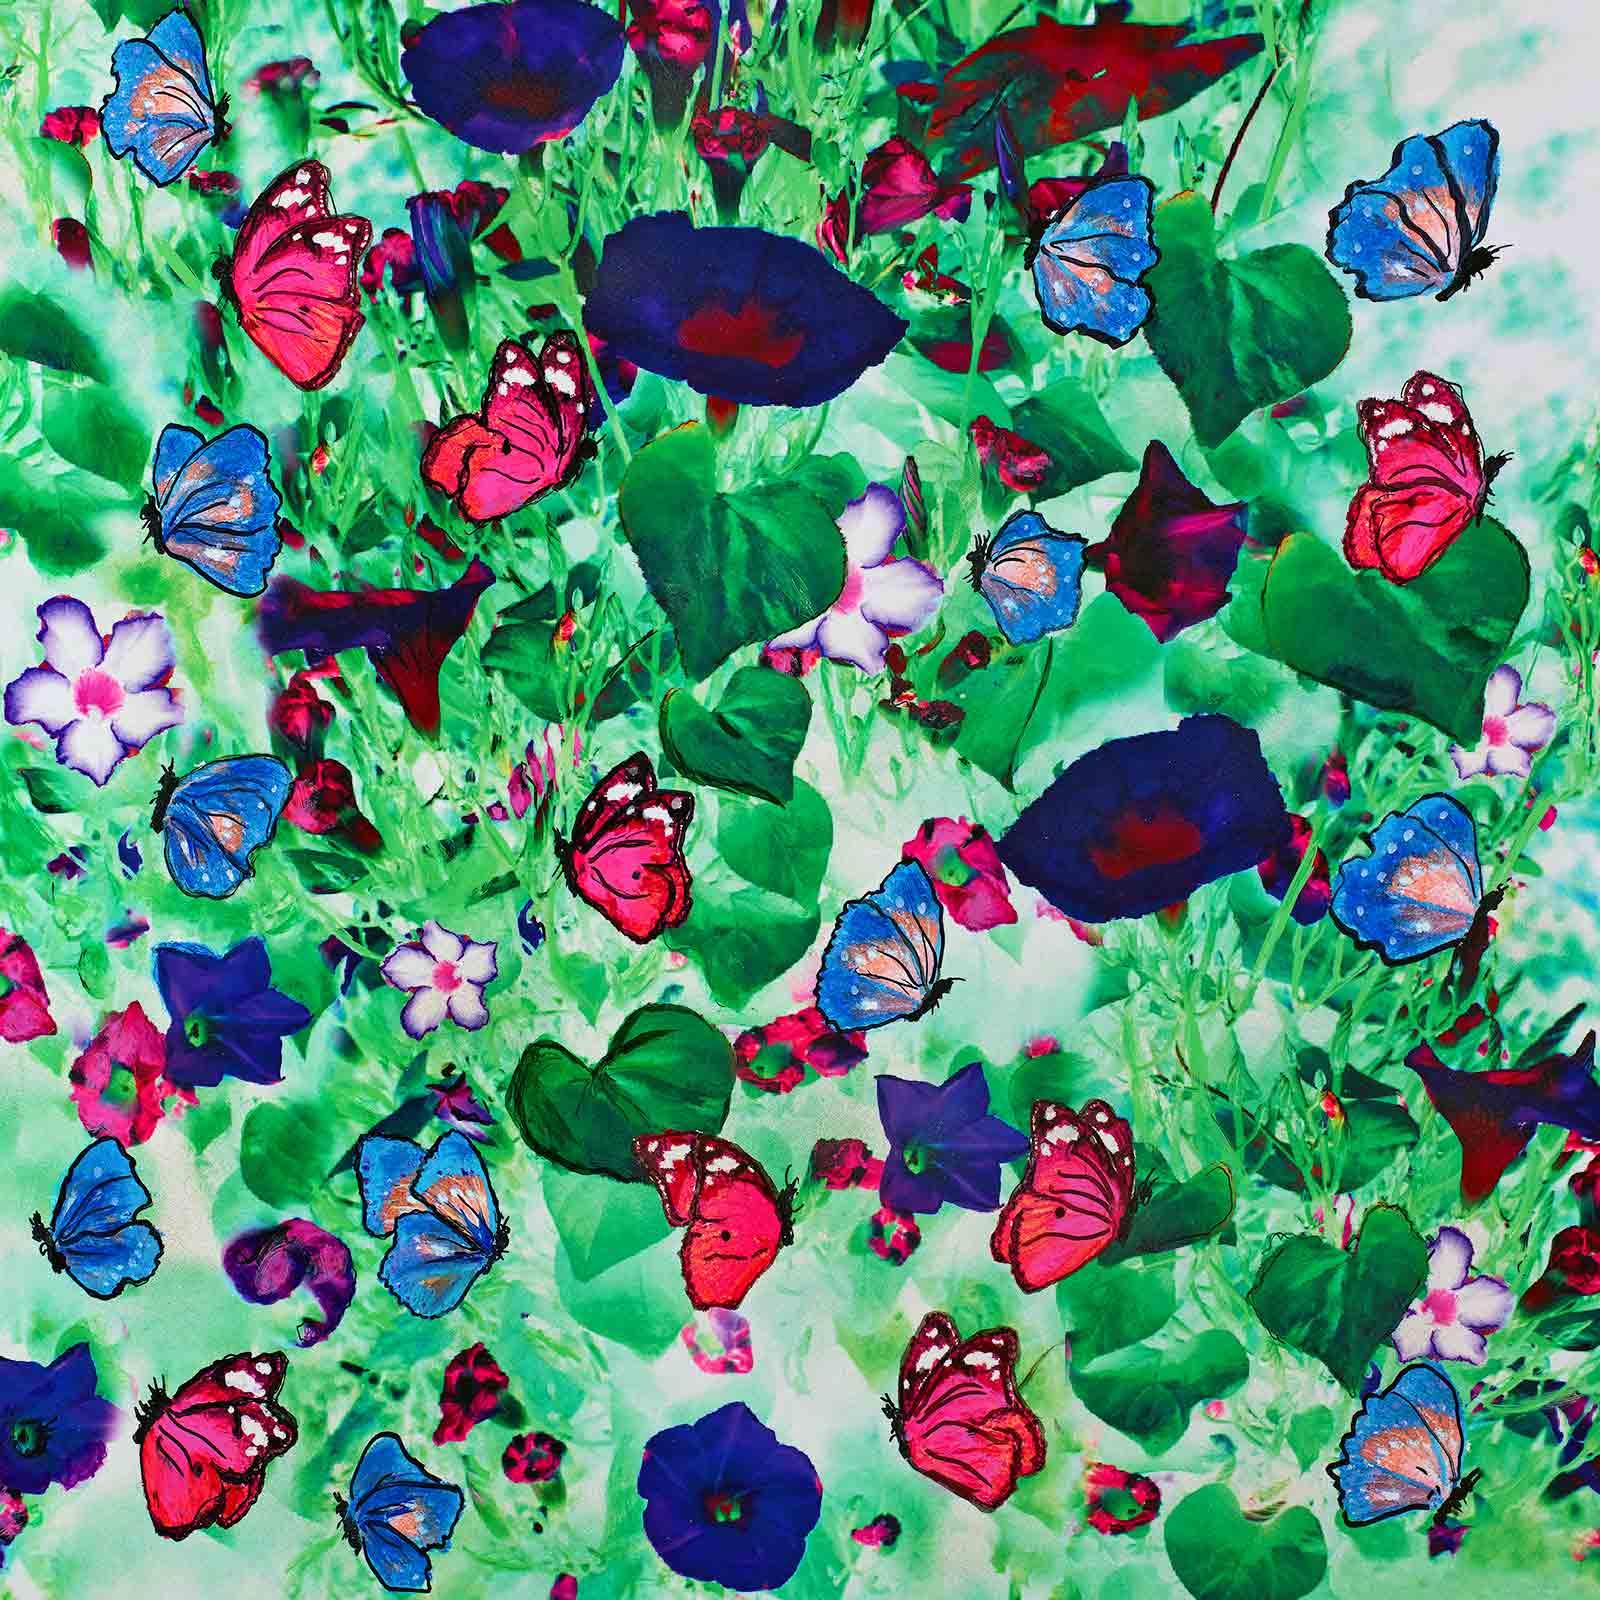 Cornelia Hagmann Contemporary Artist Limited Edition Butterfly Green, Seidenschal, sciarpa di seta, foulard soie,